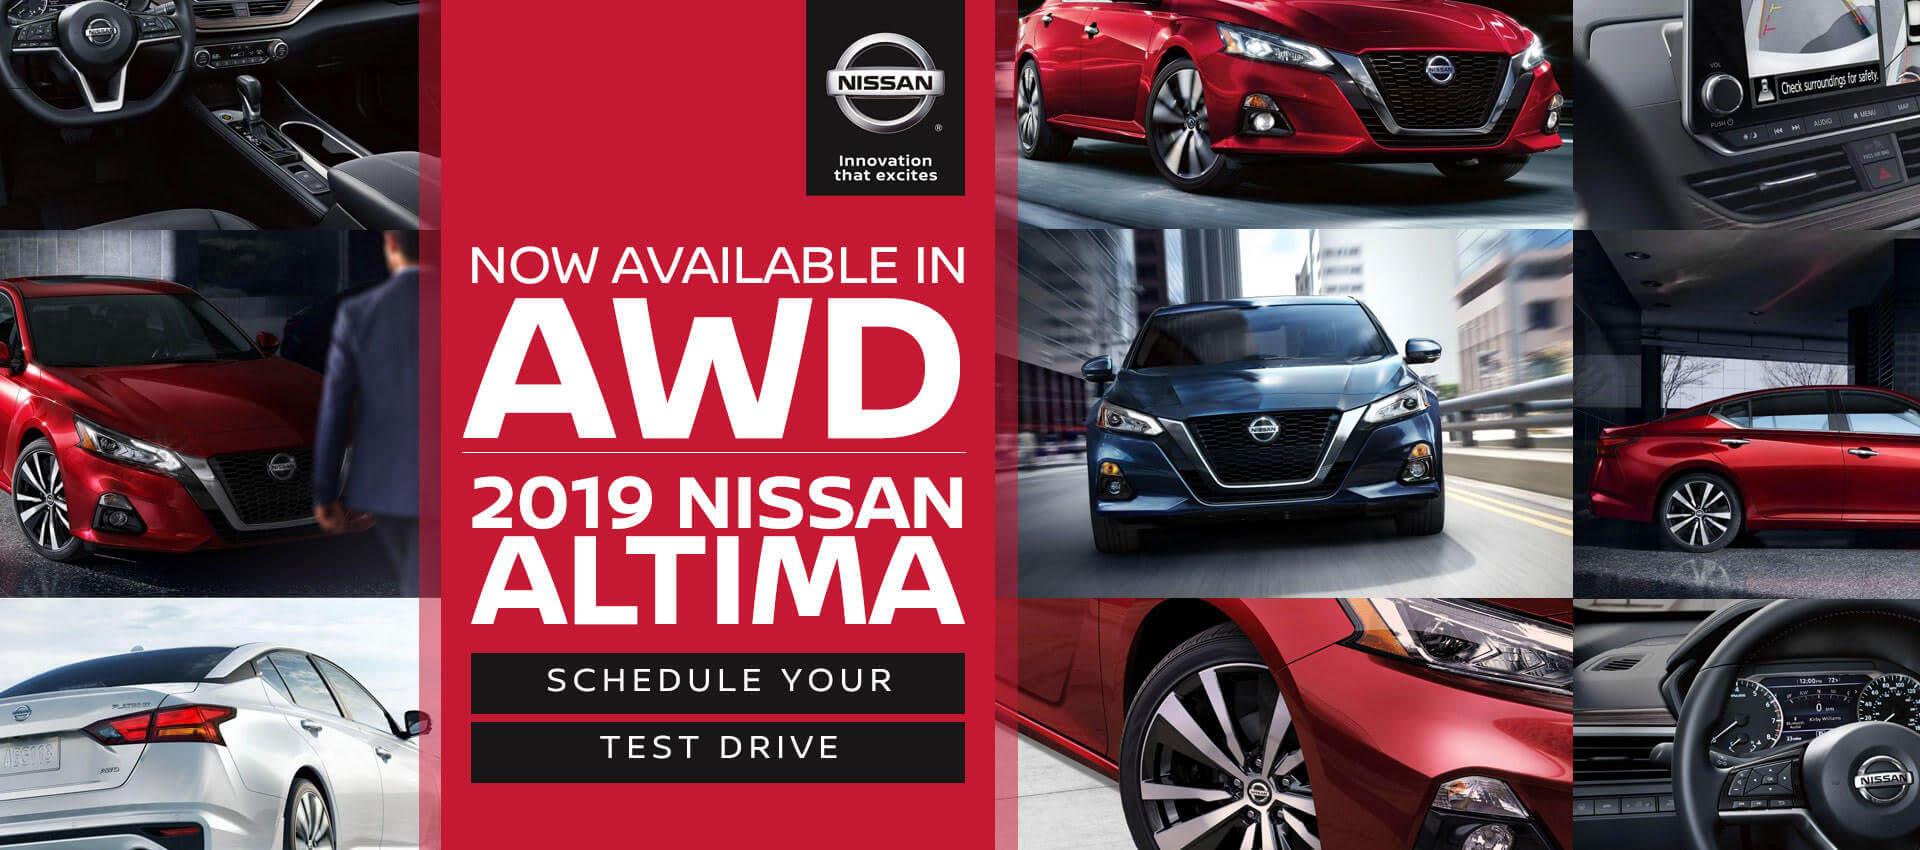 New Altima AWD